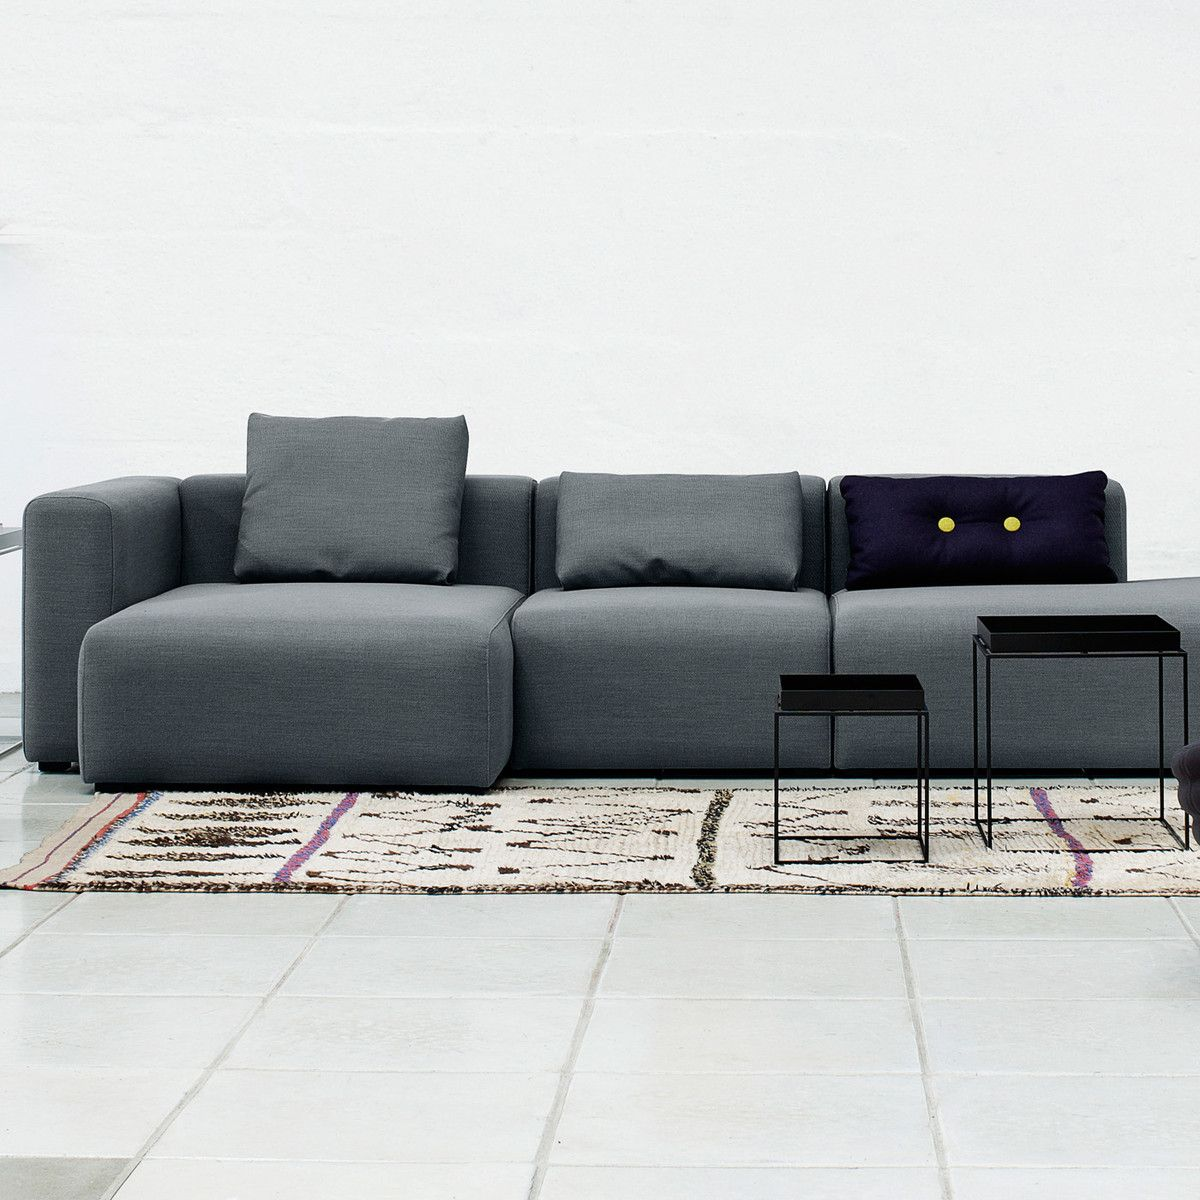 Hay Kissen Mags Cushion 9 Hellgrau Hallingdal 130 Couch